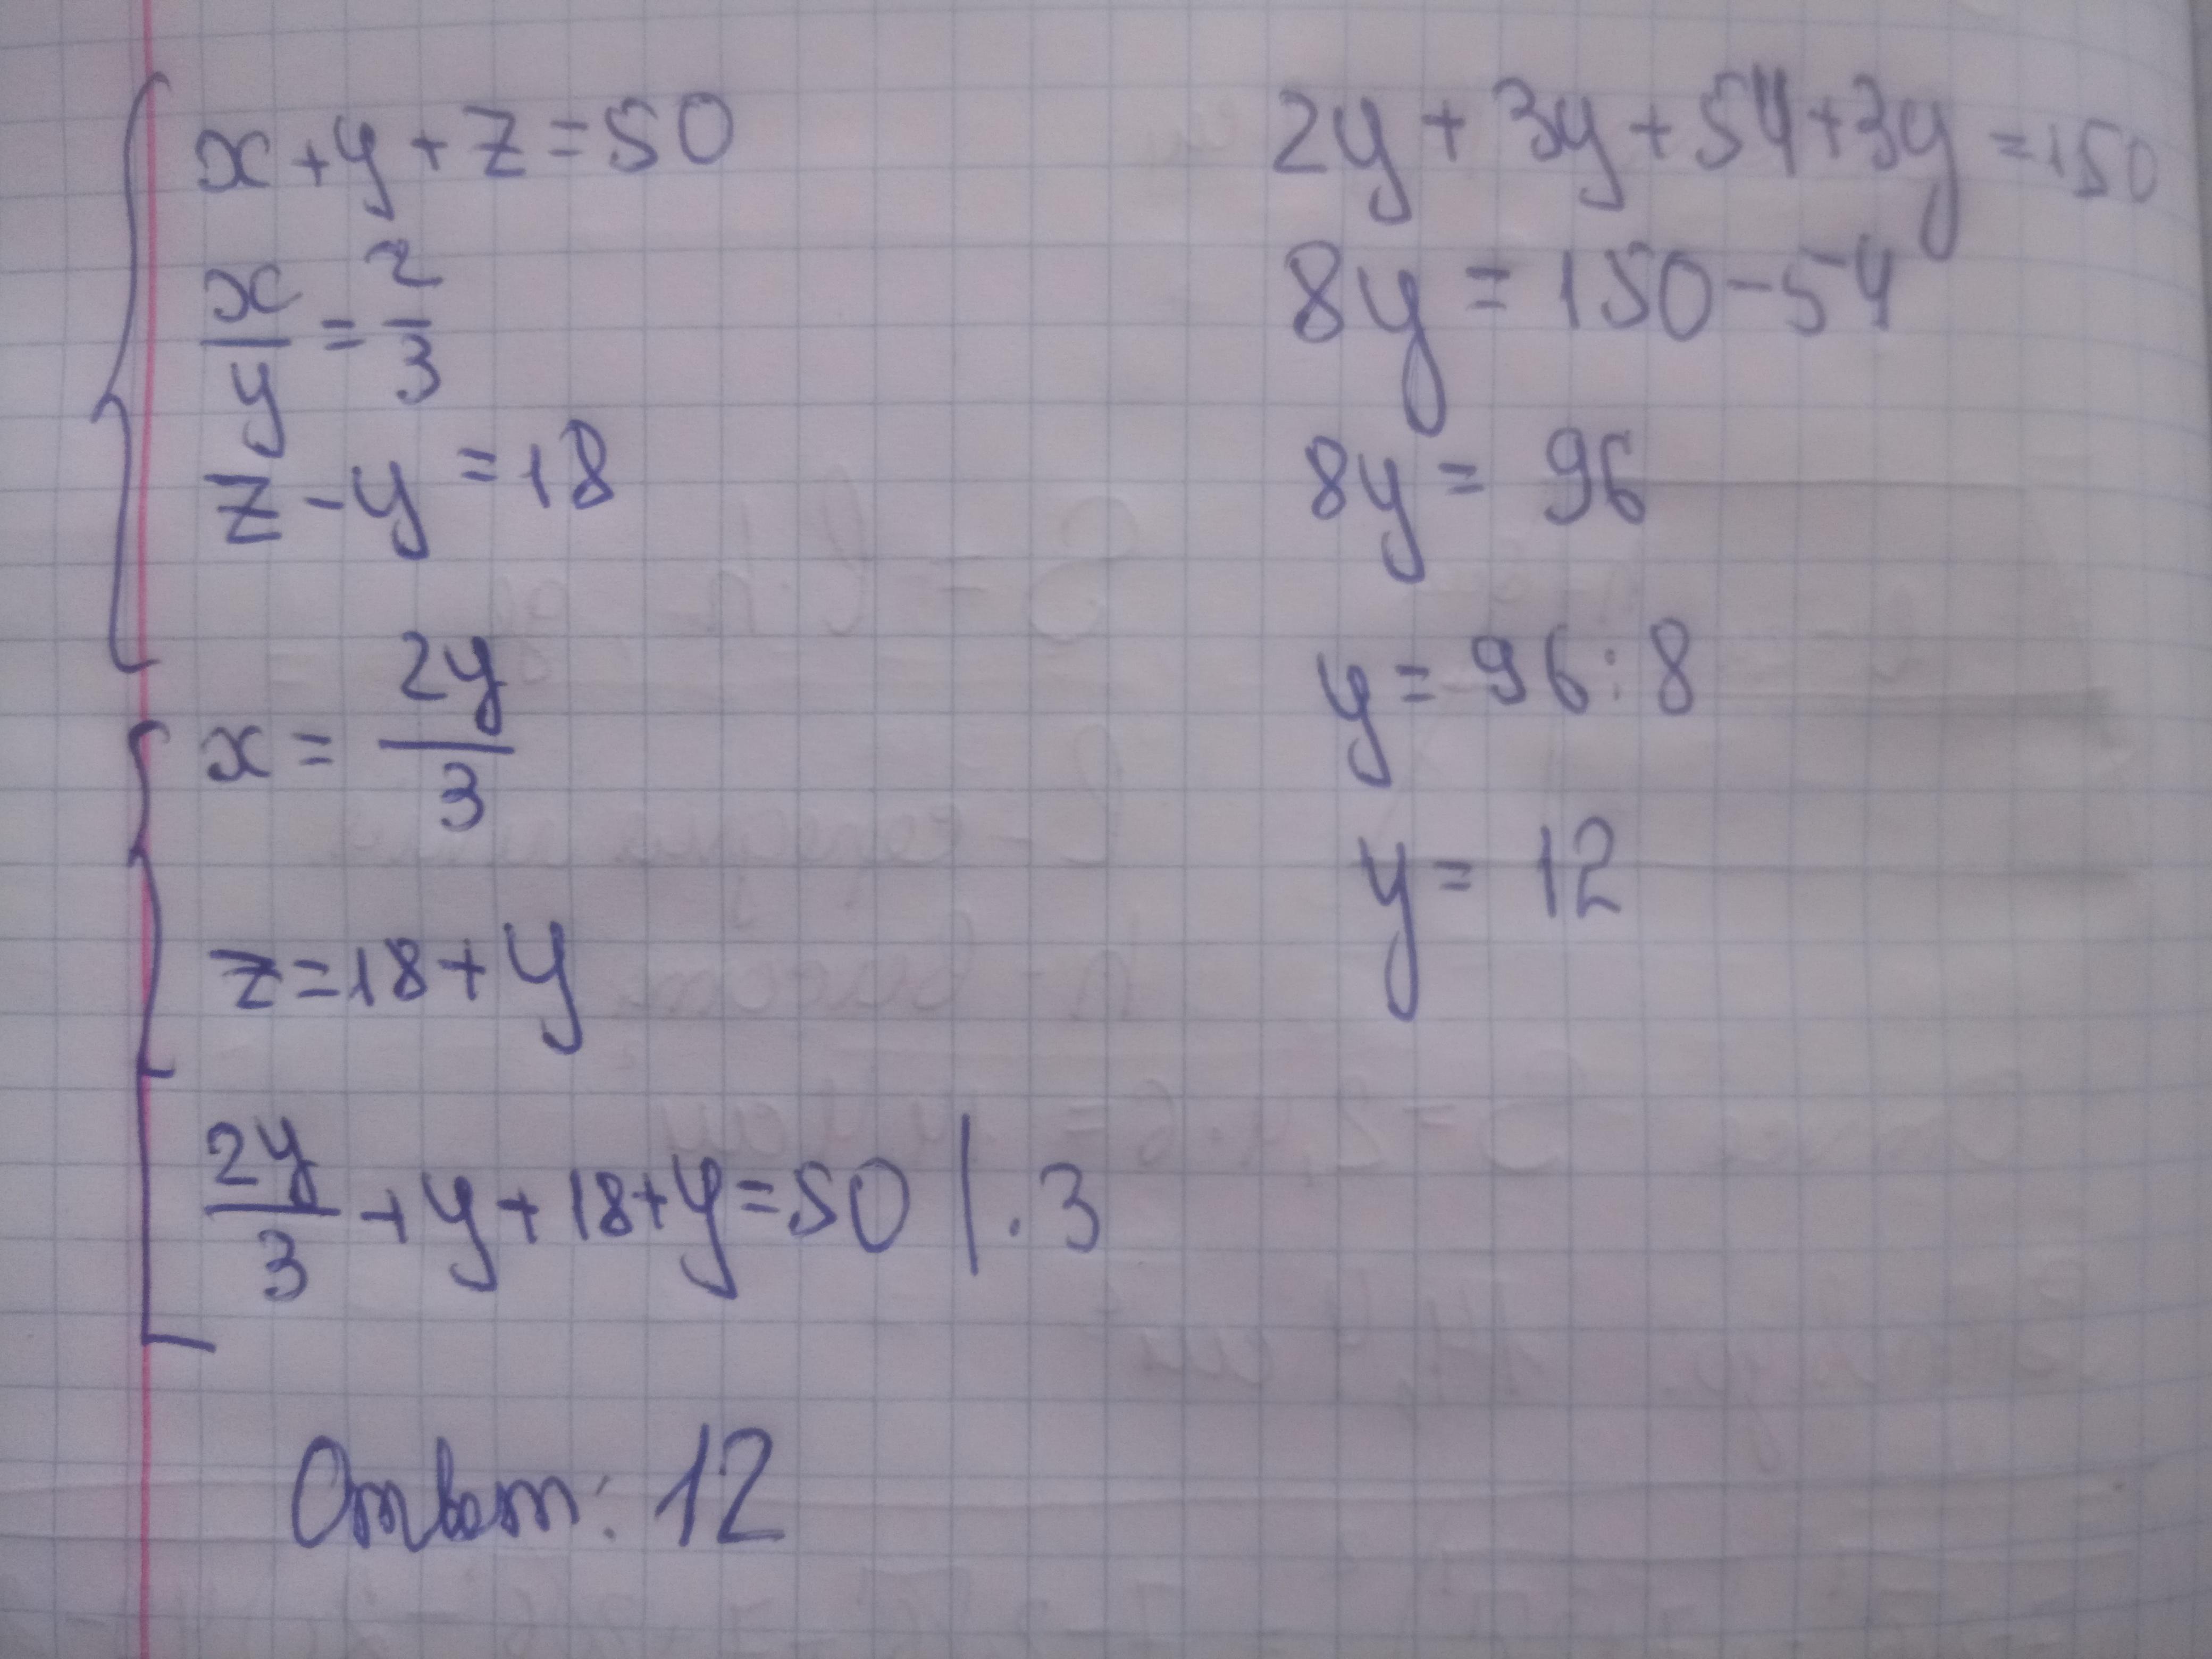 Если X+y+z=50, x:y=2:3, z-y=18, тогда Y-? A)30